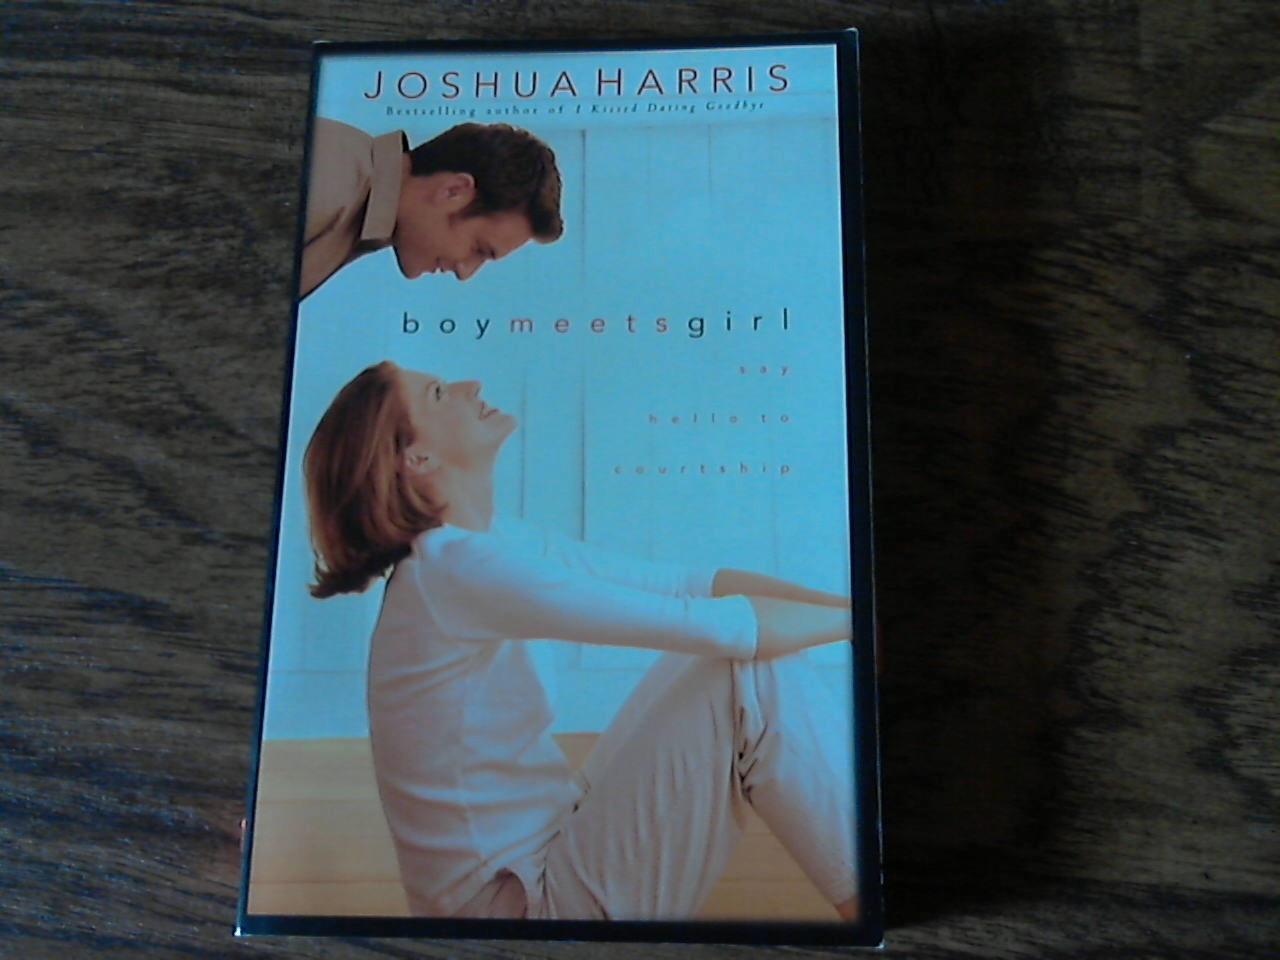 boy meets girl joshua harris Buy the boy meets girl: say hello to courtship ebook in boy meets girl, joshua harris —the guy who kissed dating goodbye—makes the case for courtship.